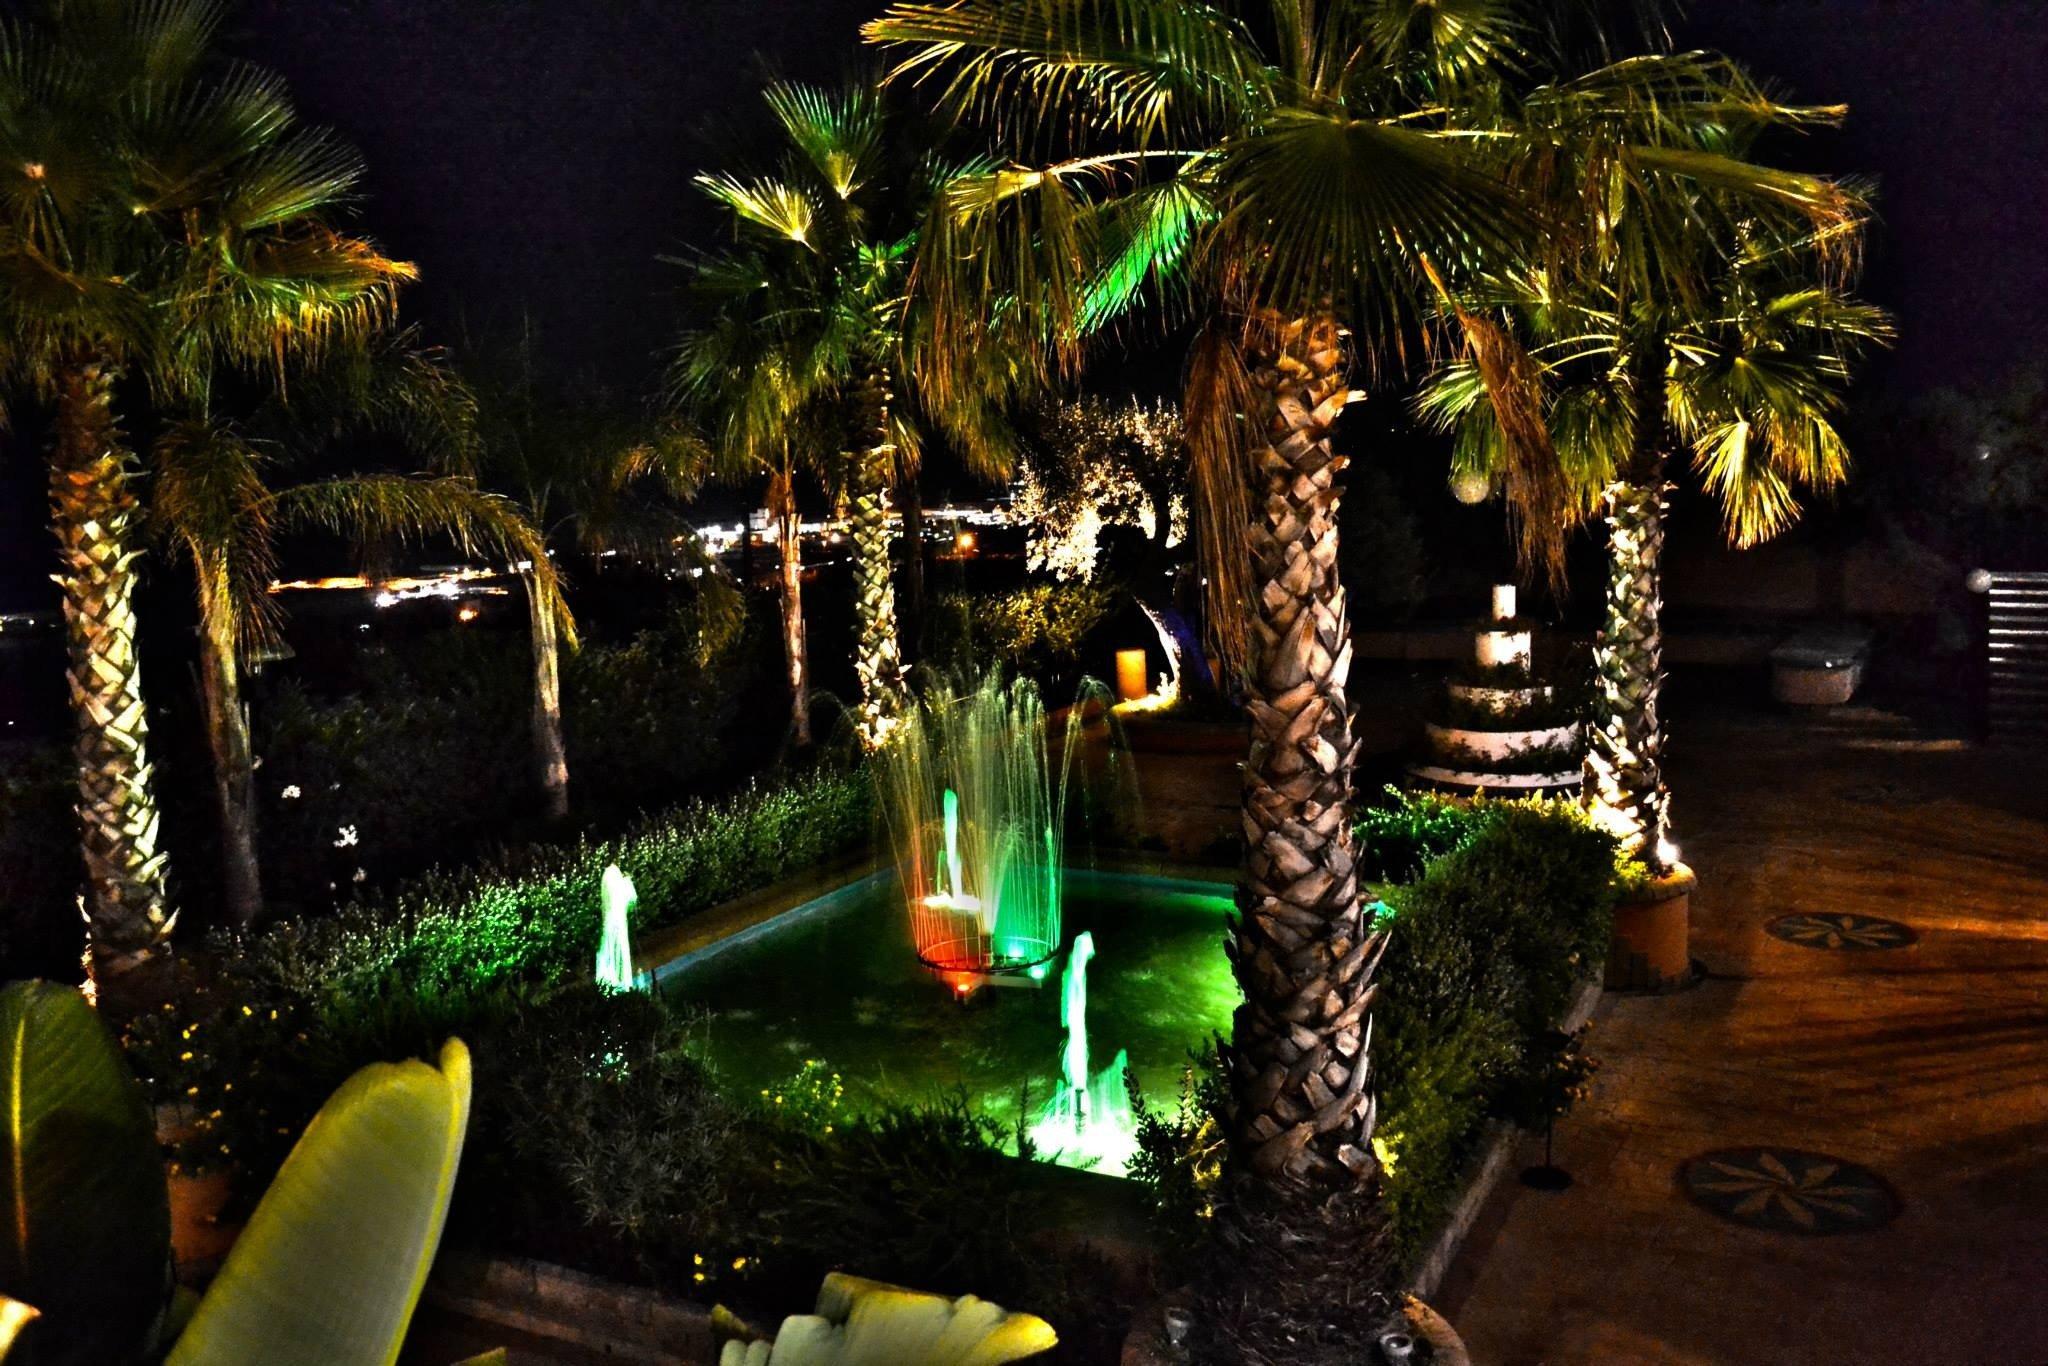 Fontana illuminata esterna con palme